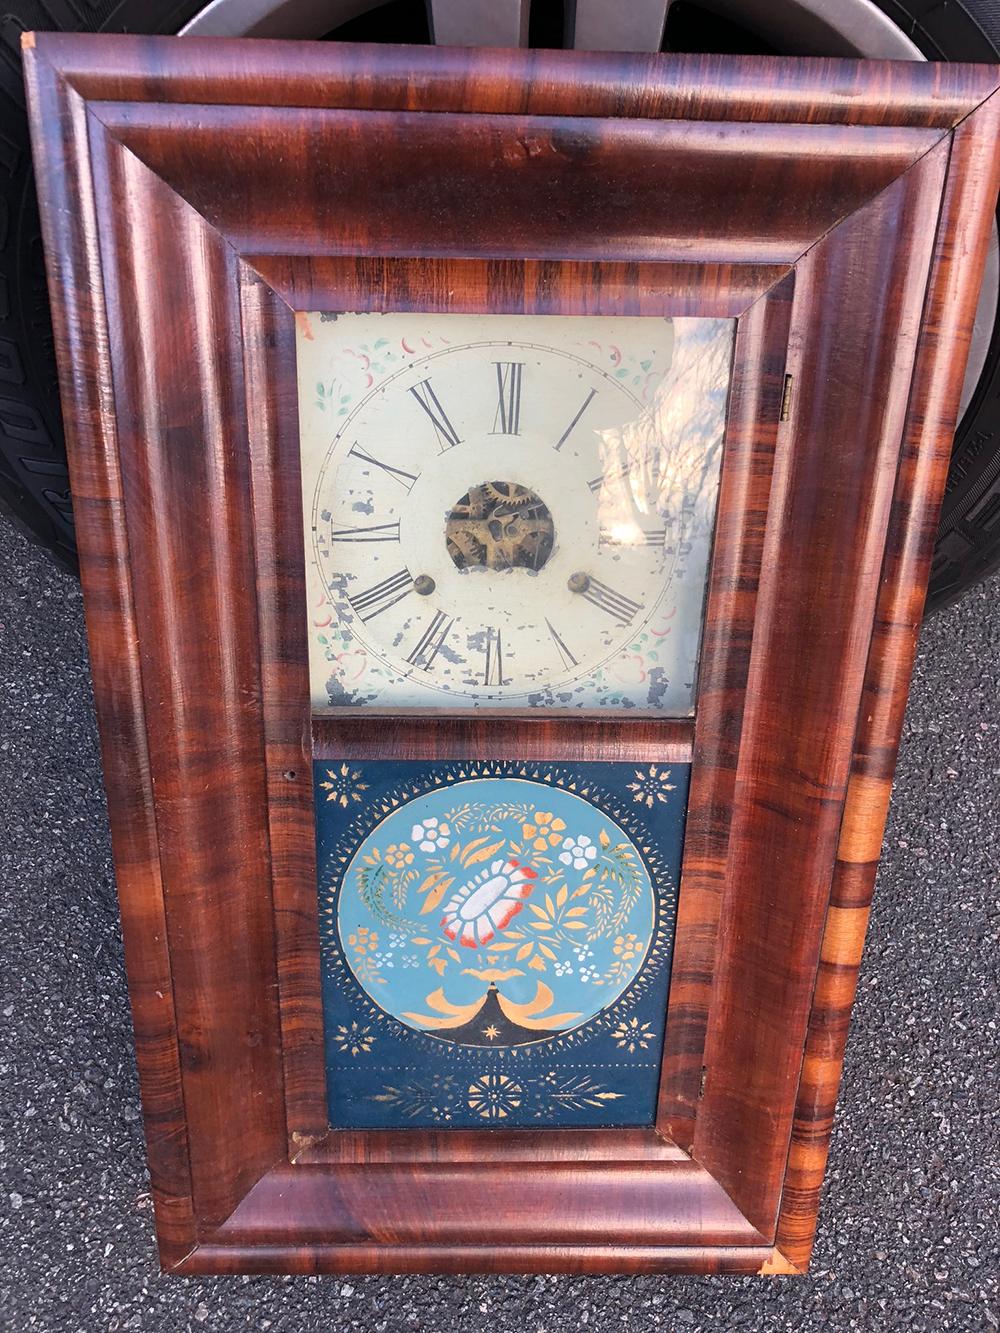 J.C. Brown OG Shelf Clock